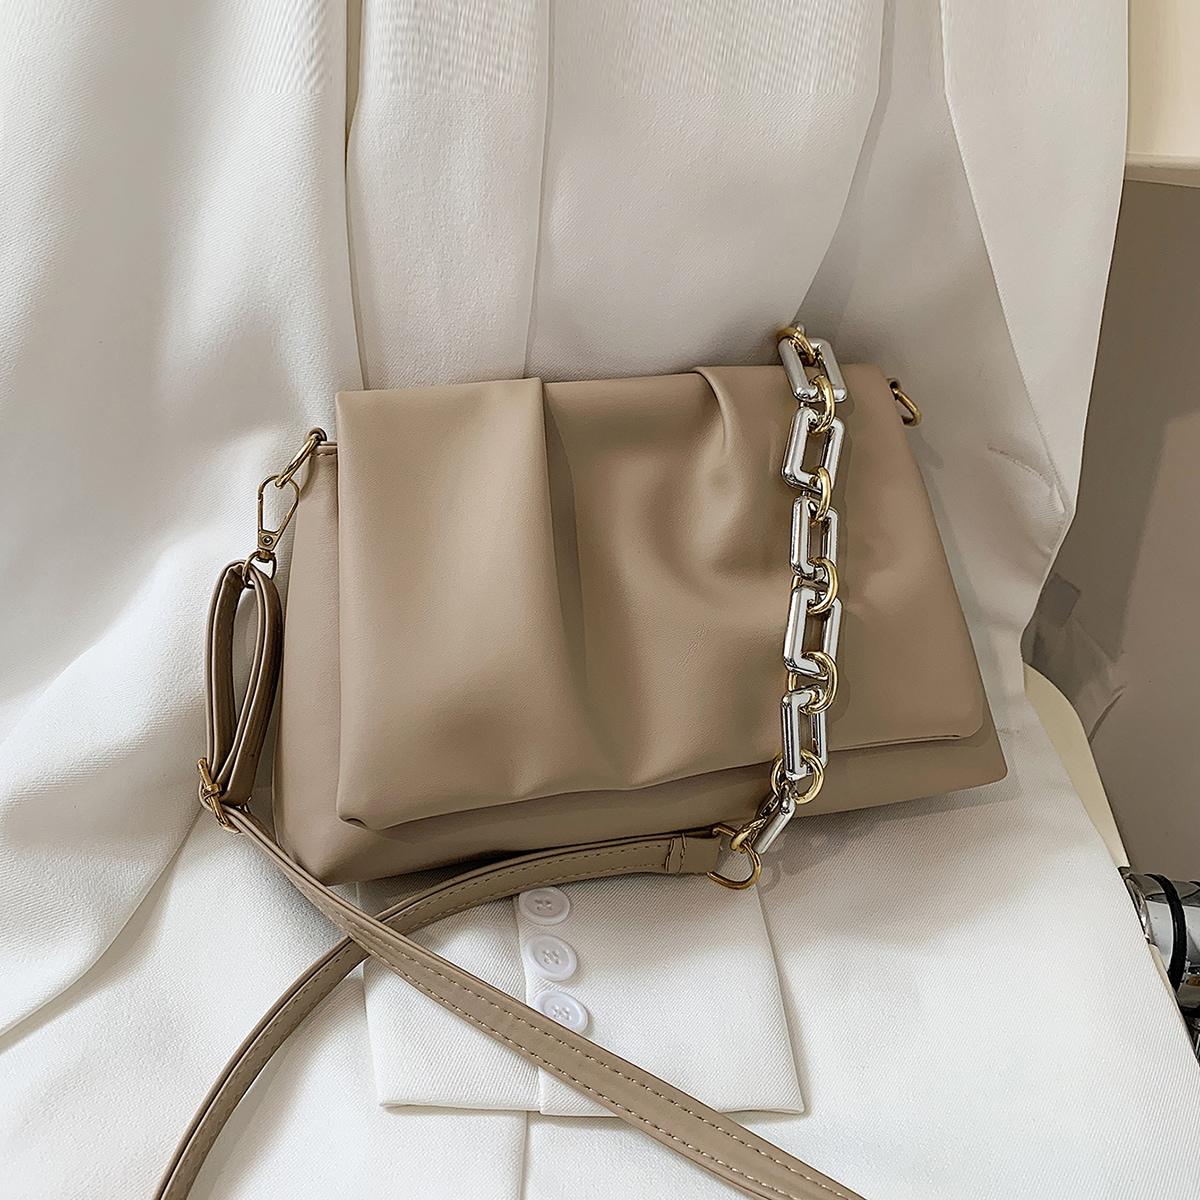 Минималистичная сумка через плечо со сборками